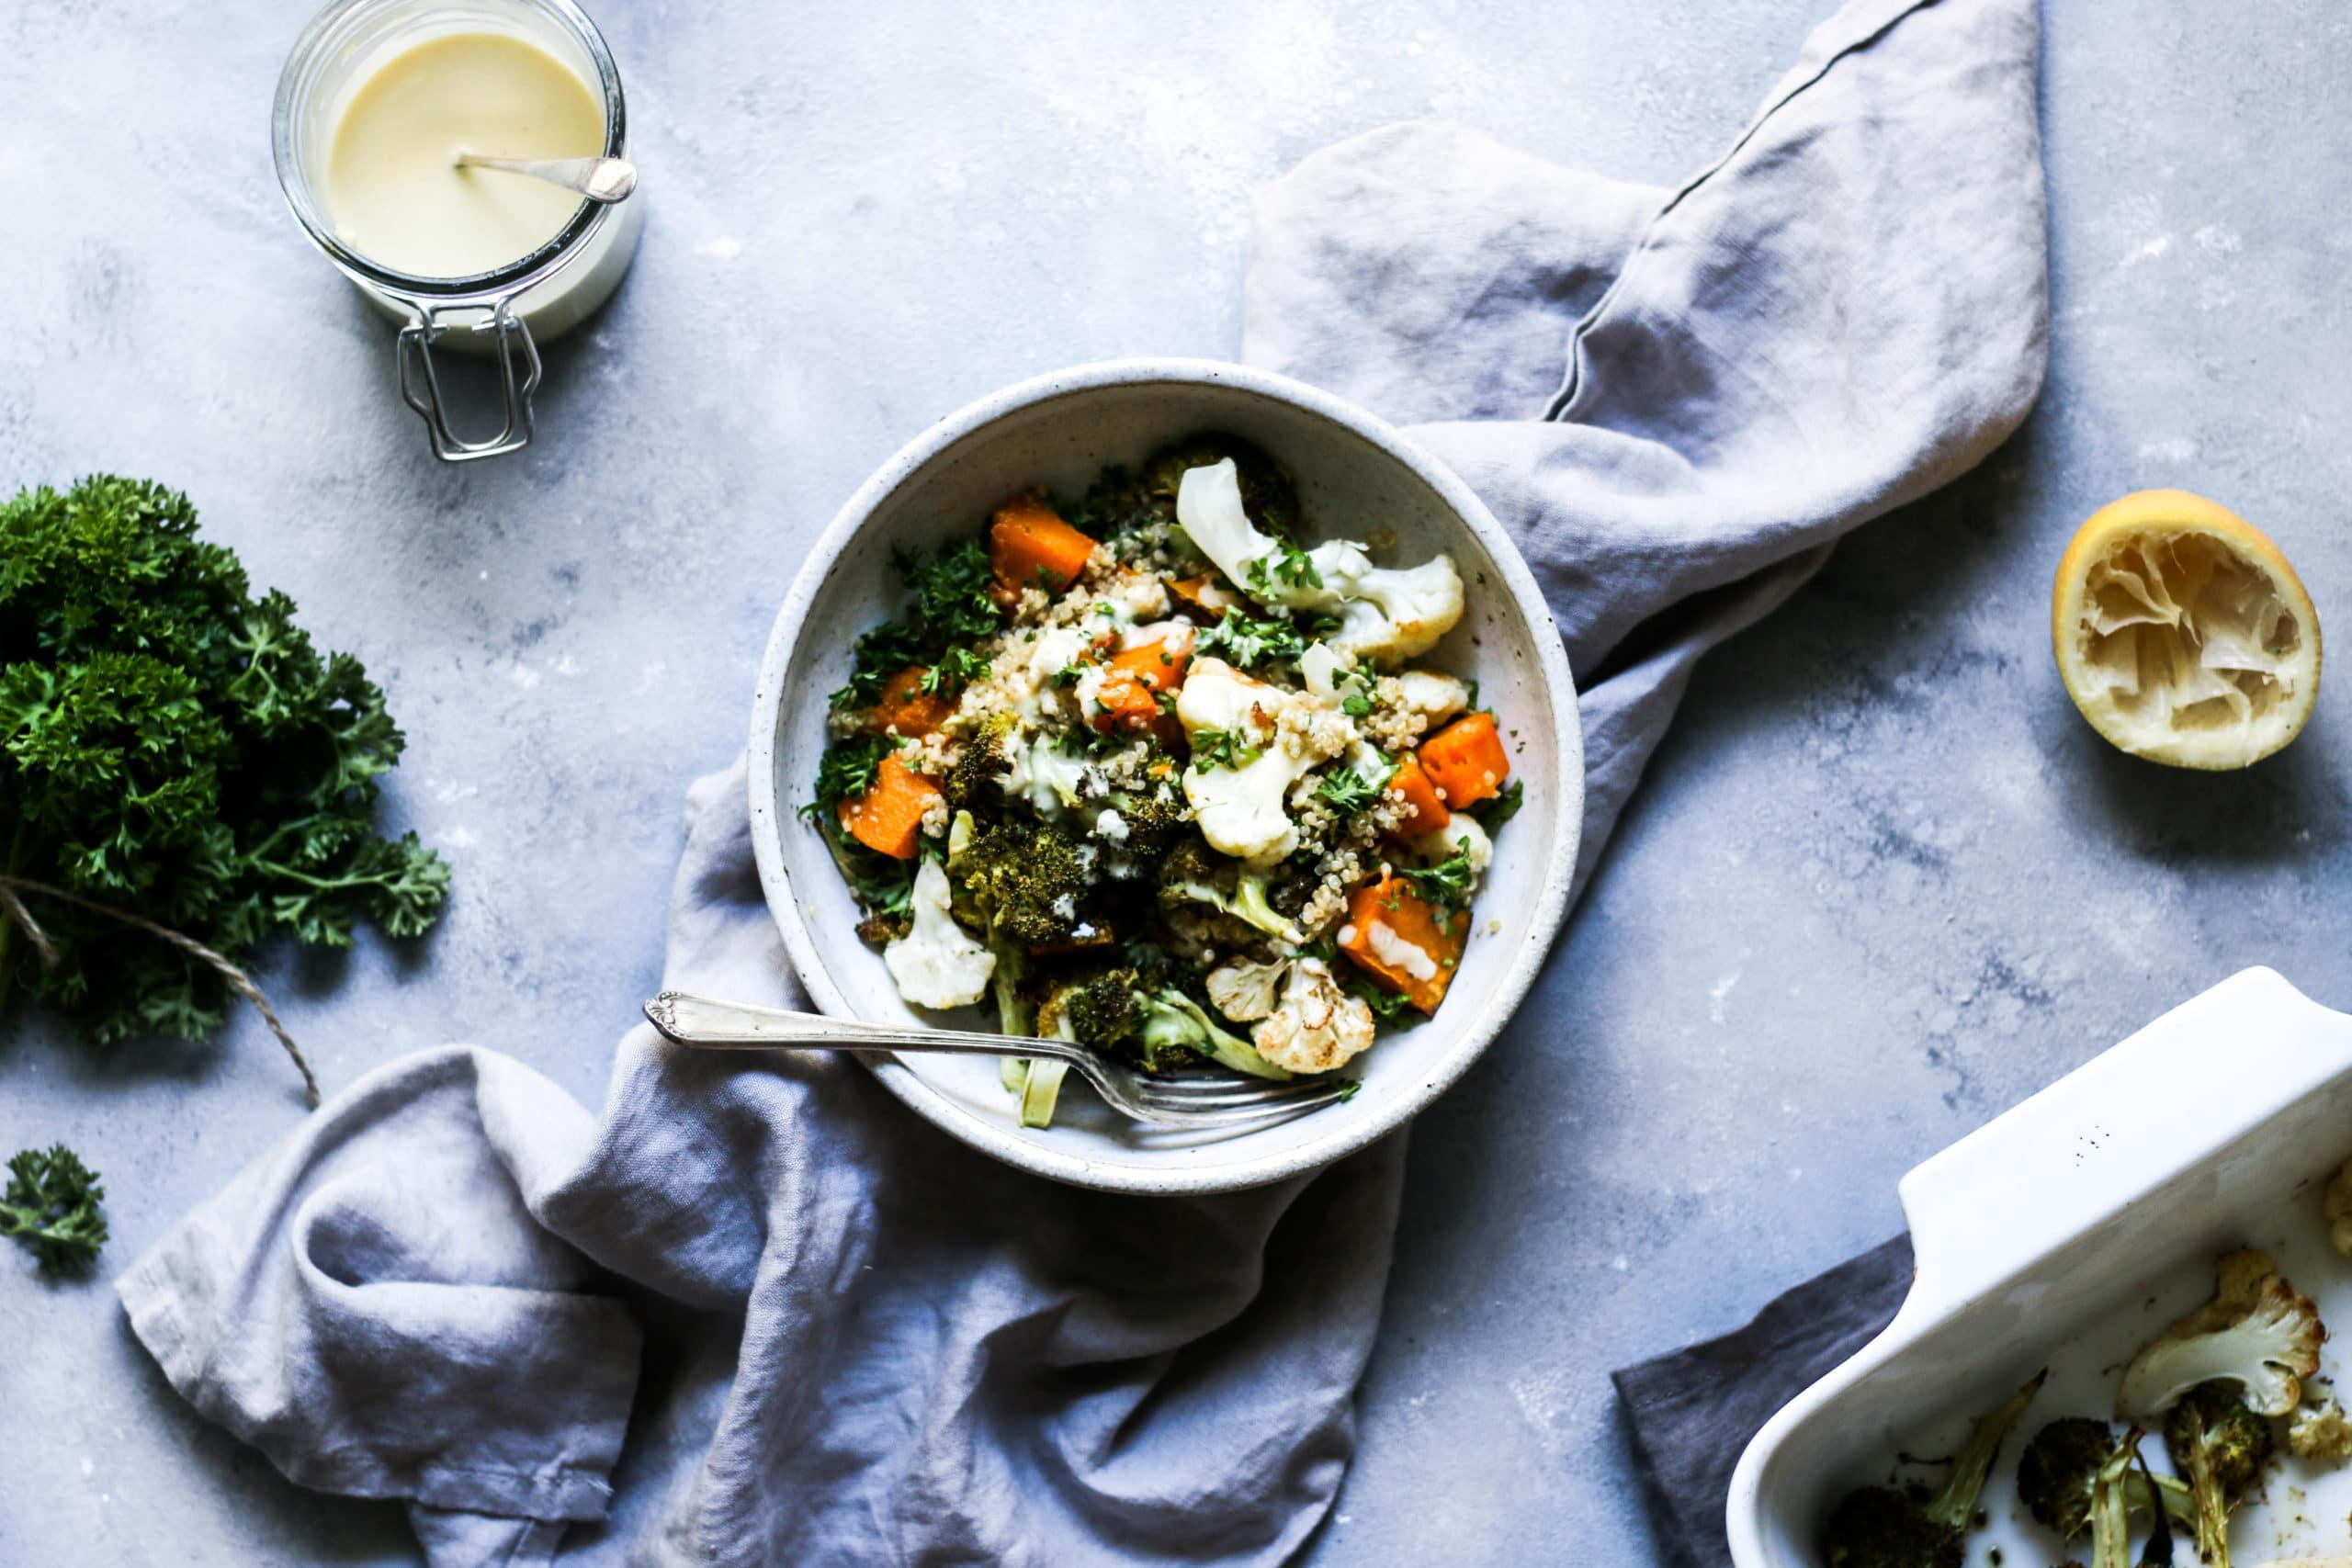 gluten free, paleo, dairy free, vegetarian salad recipe, vegan salad recipe, vegan recipes, autumn salad, warm autumn salad, gluten free recipe, dairy free recipe